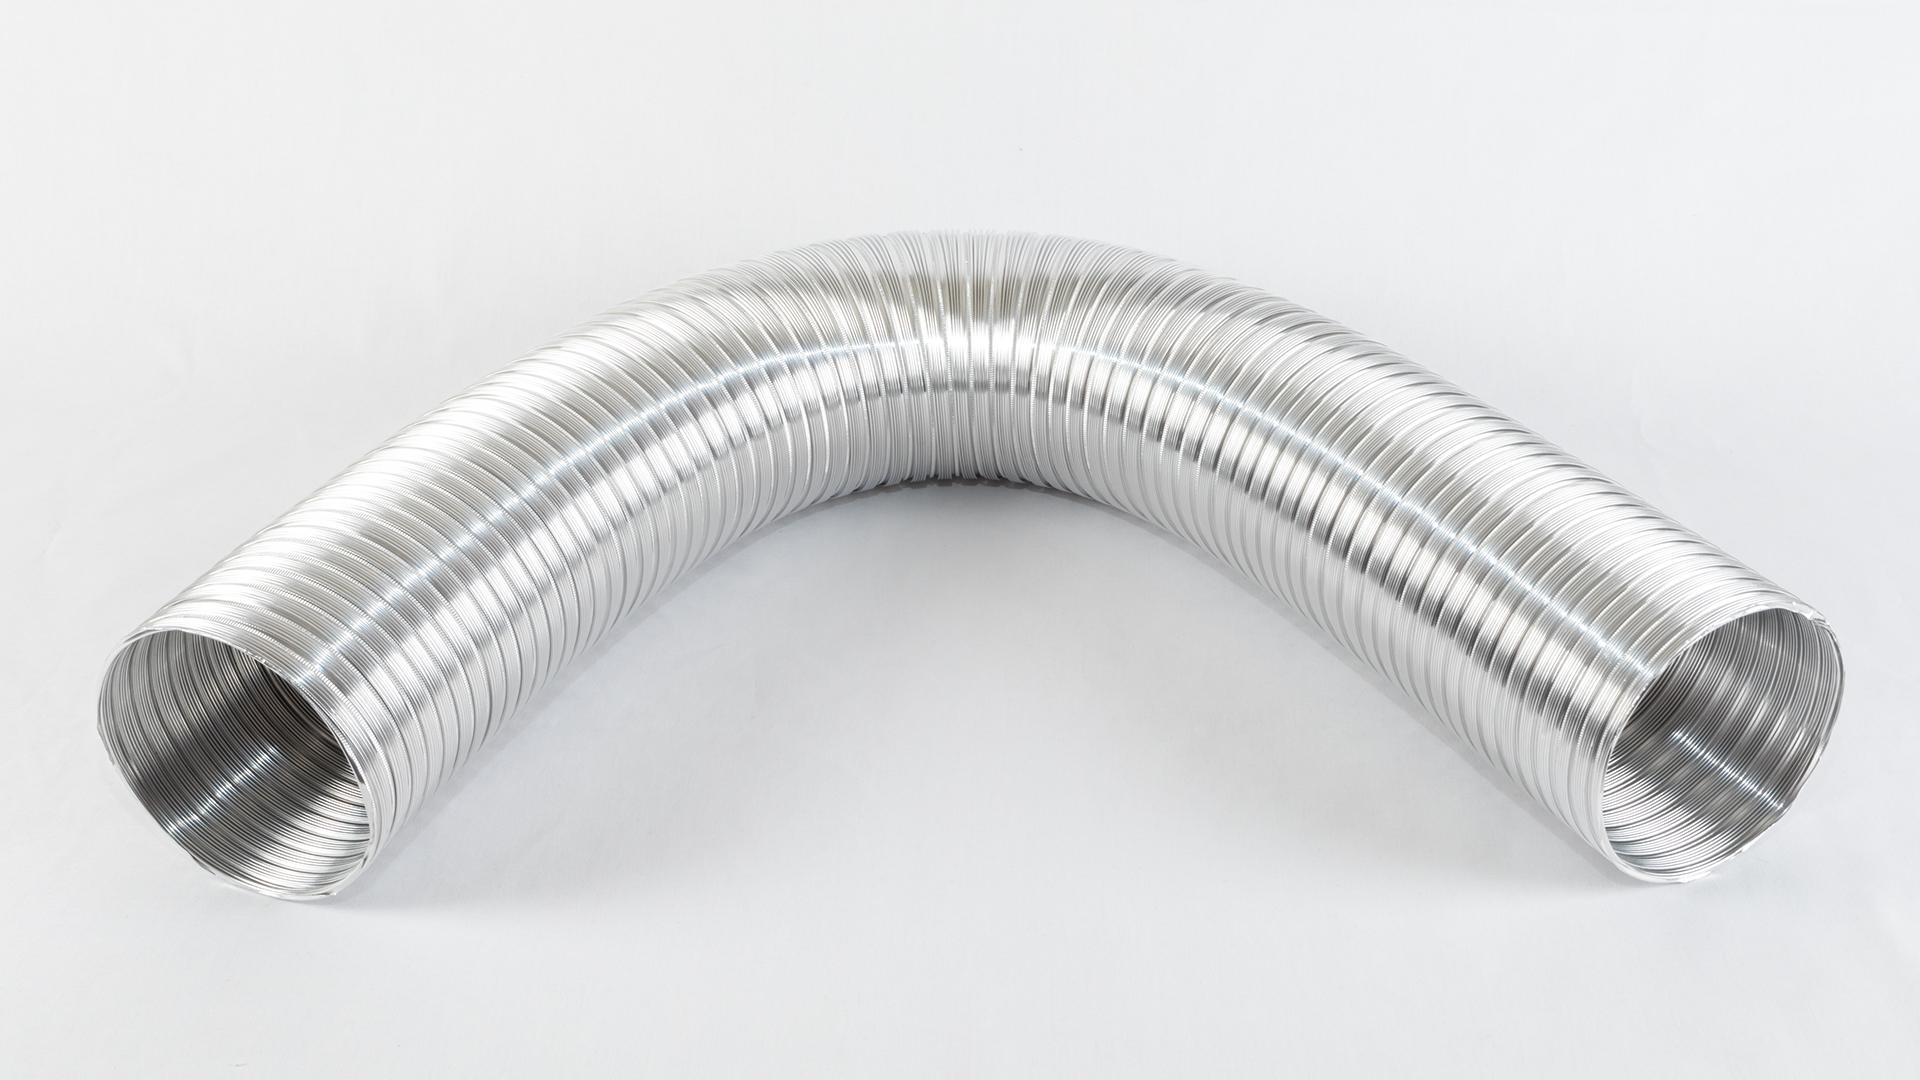 tuburi extensibile din aluminiu gofrate